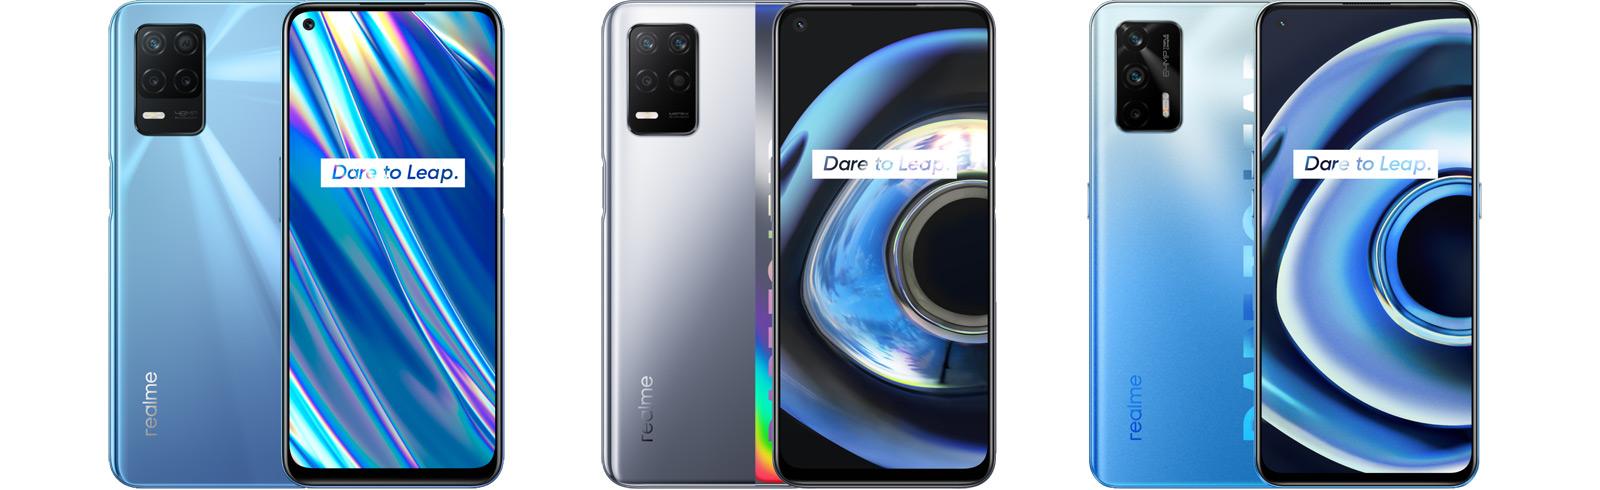 Realme Q3 Pro 5G, Q3 5G, and Q3i 5G are unveiled in China